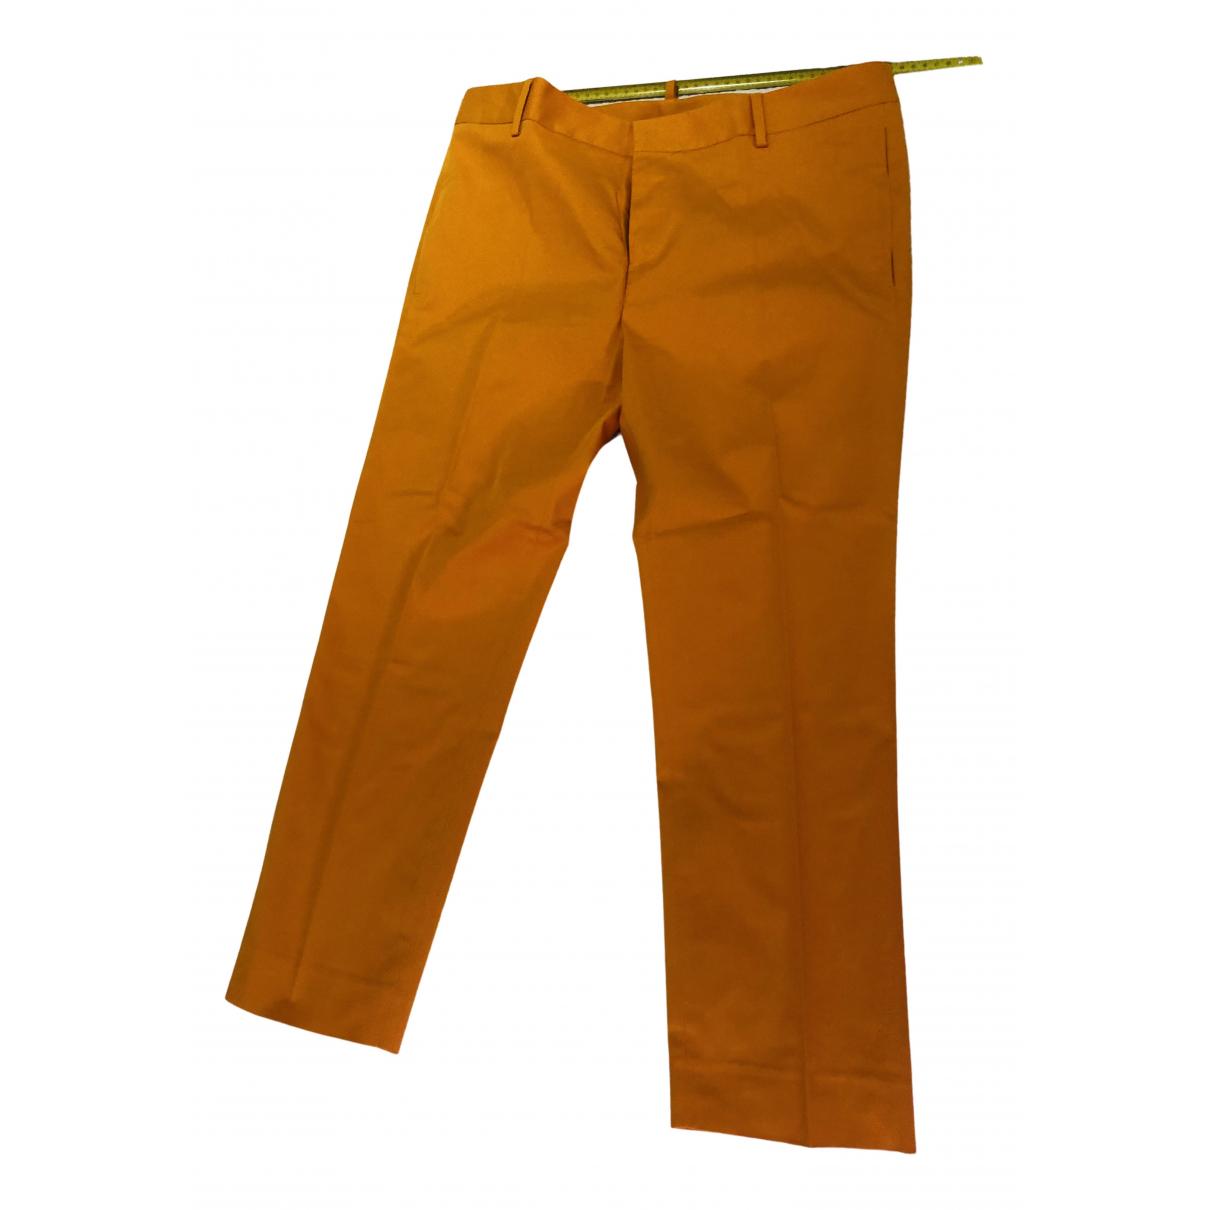 Dsquared2 N Orange Cotton Trousers for Women 44 IT